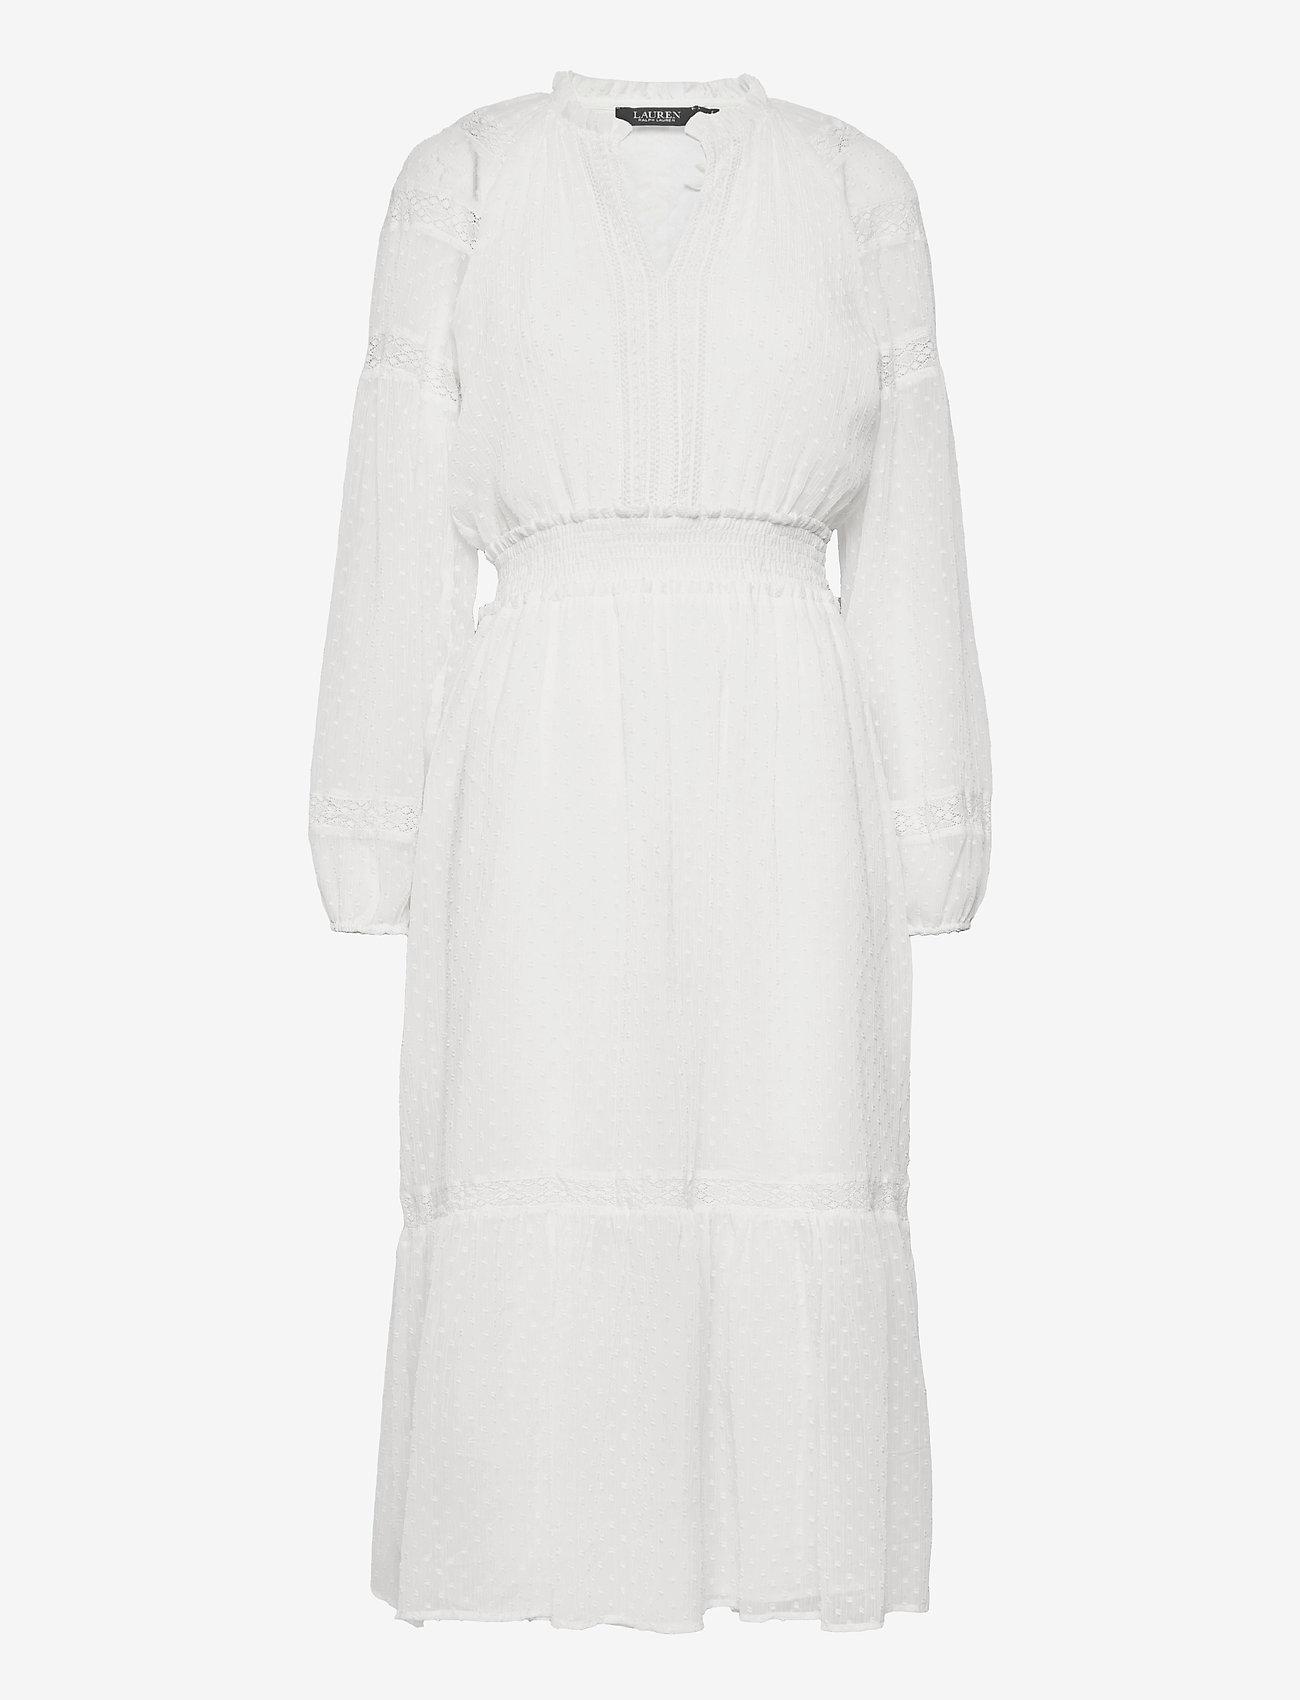 Lauren Ralph Lauren - Polka-Dot Lace-Trim Dobby Dress - alledaagse jurken - lauren white - 1